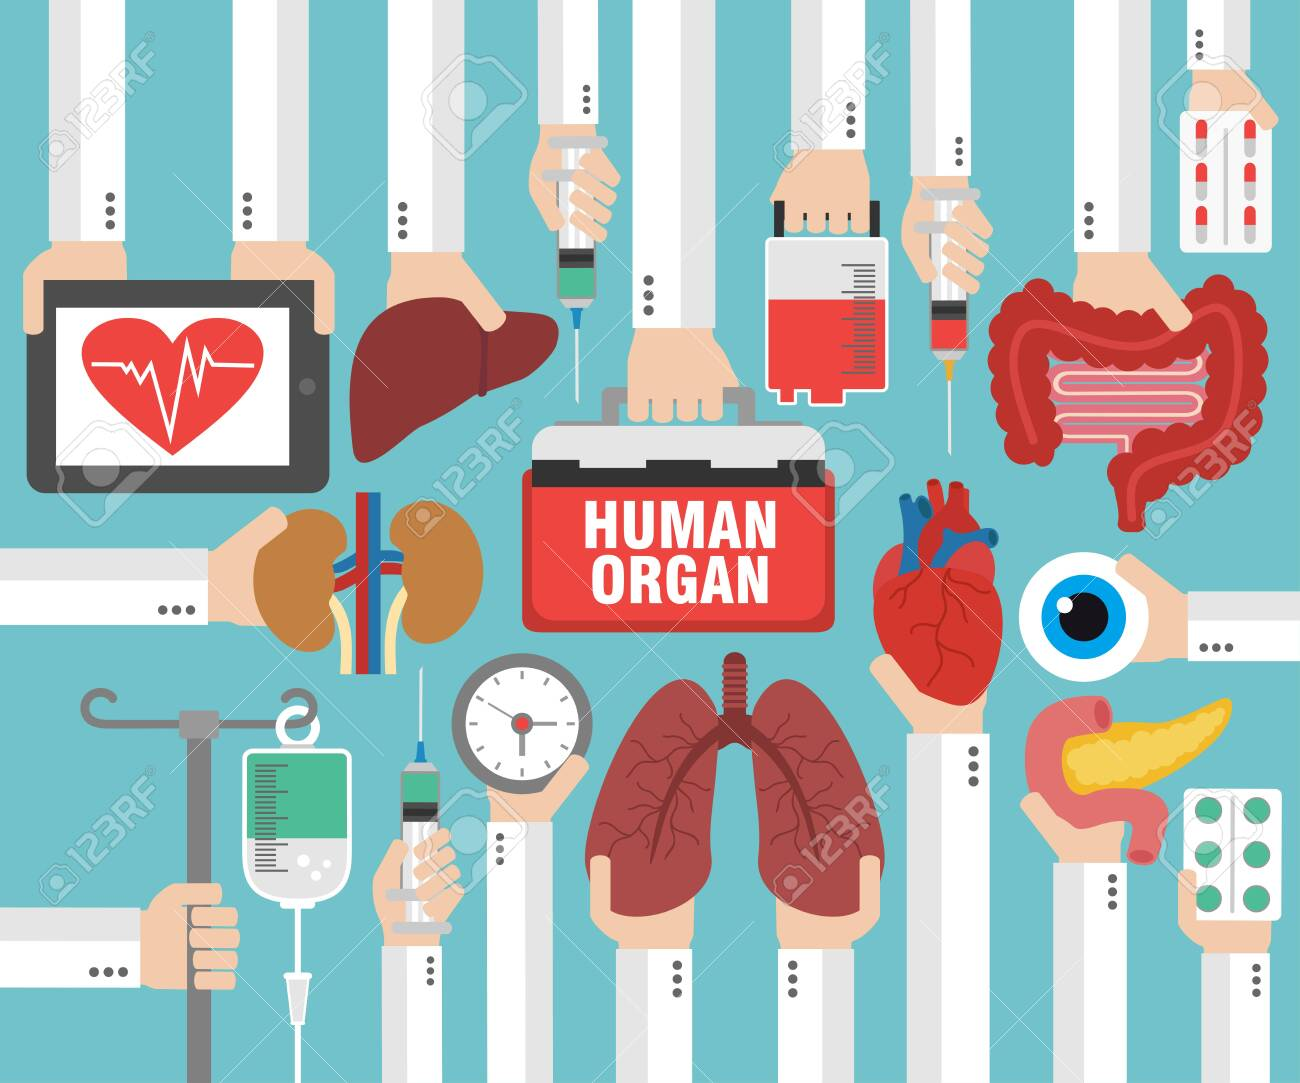 Medical concept design flat. Human organ for transplant. Vector illustration - 147476624